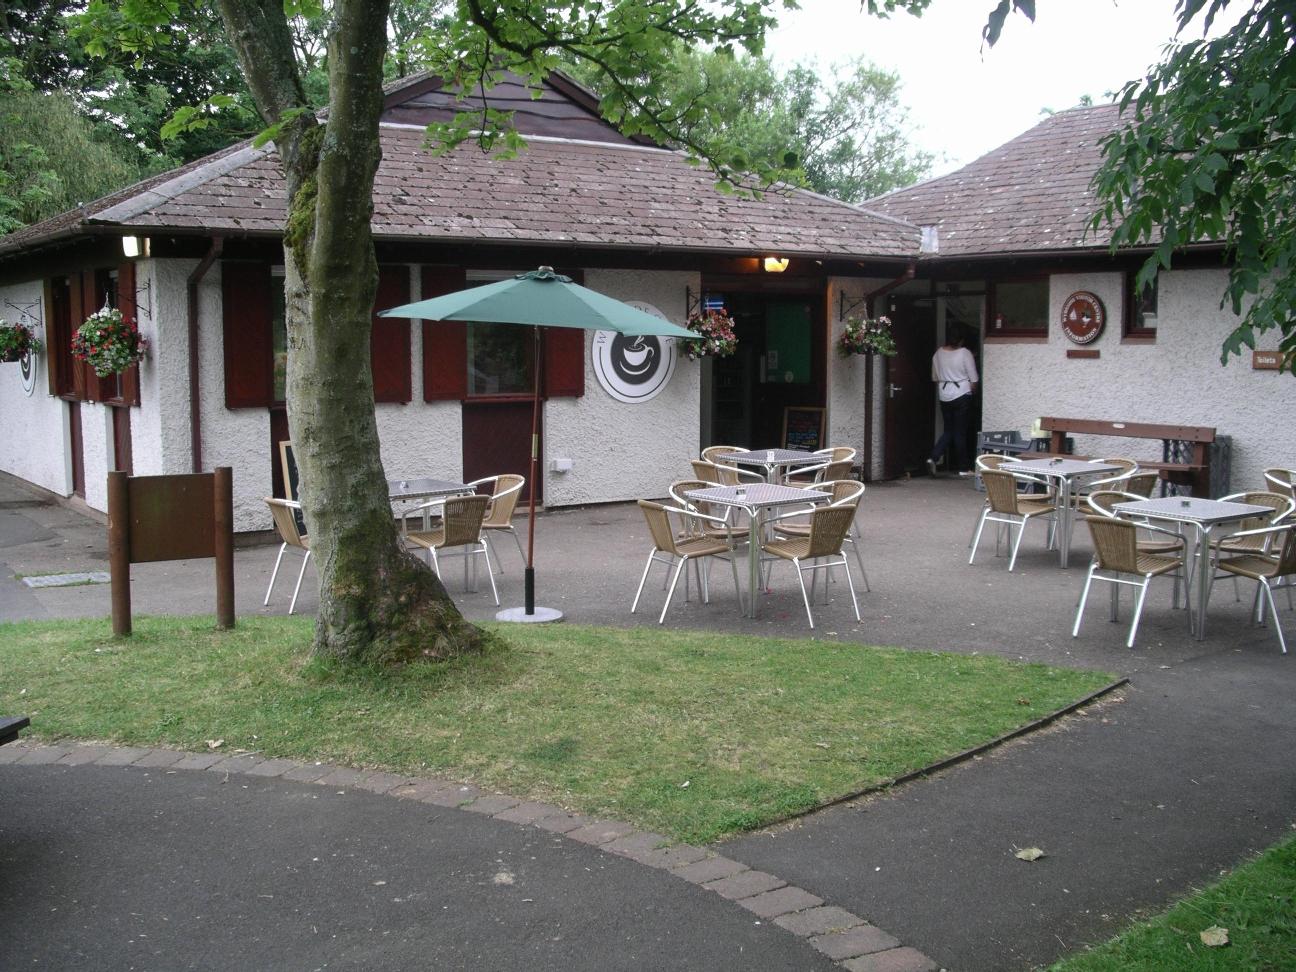 Wyre estuary country park cafe